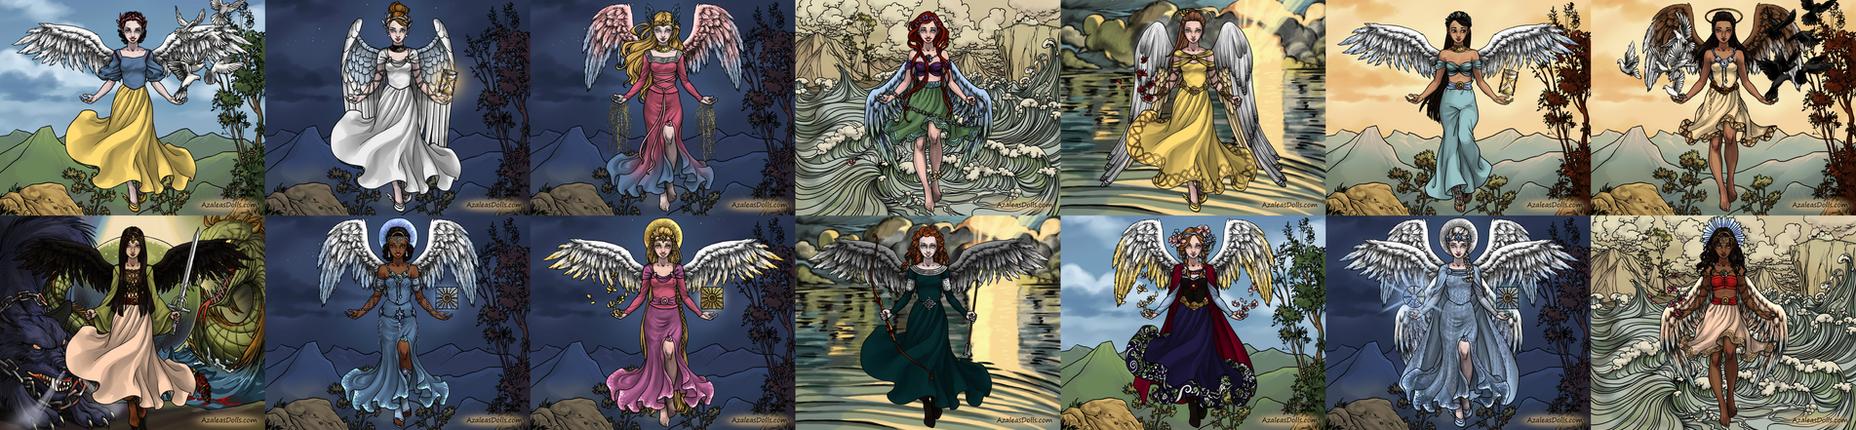 Angelic Princesses by Lunakinesis